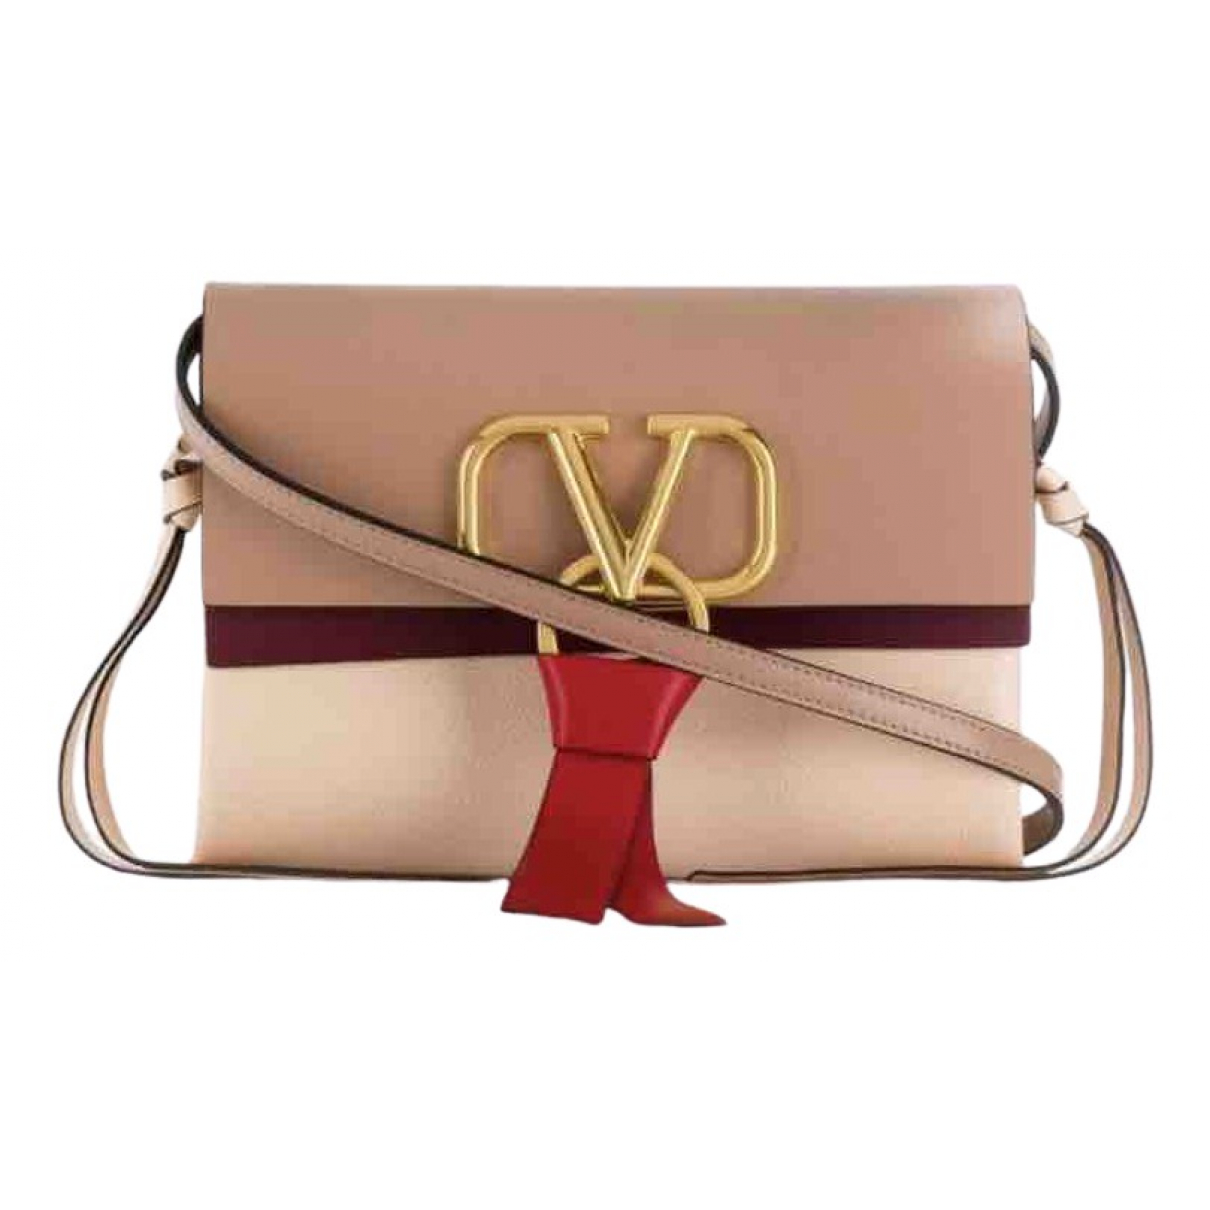 Valentino Garavani - Sac a main Vring pour femme en cuir - beige